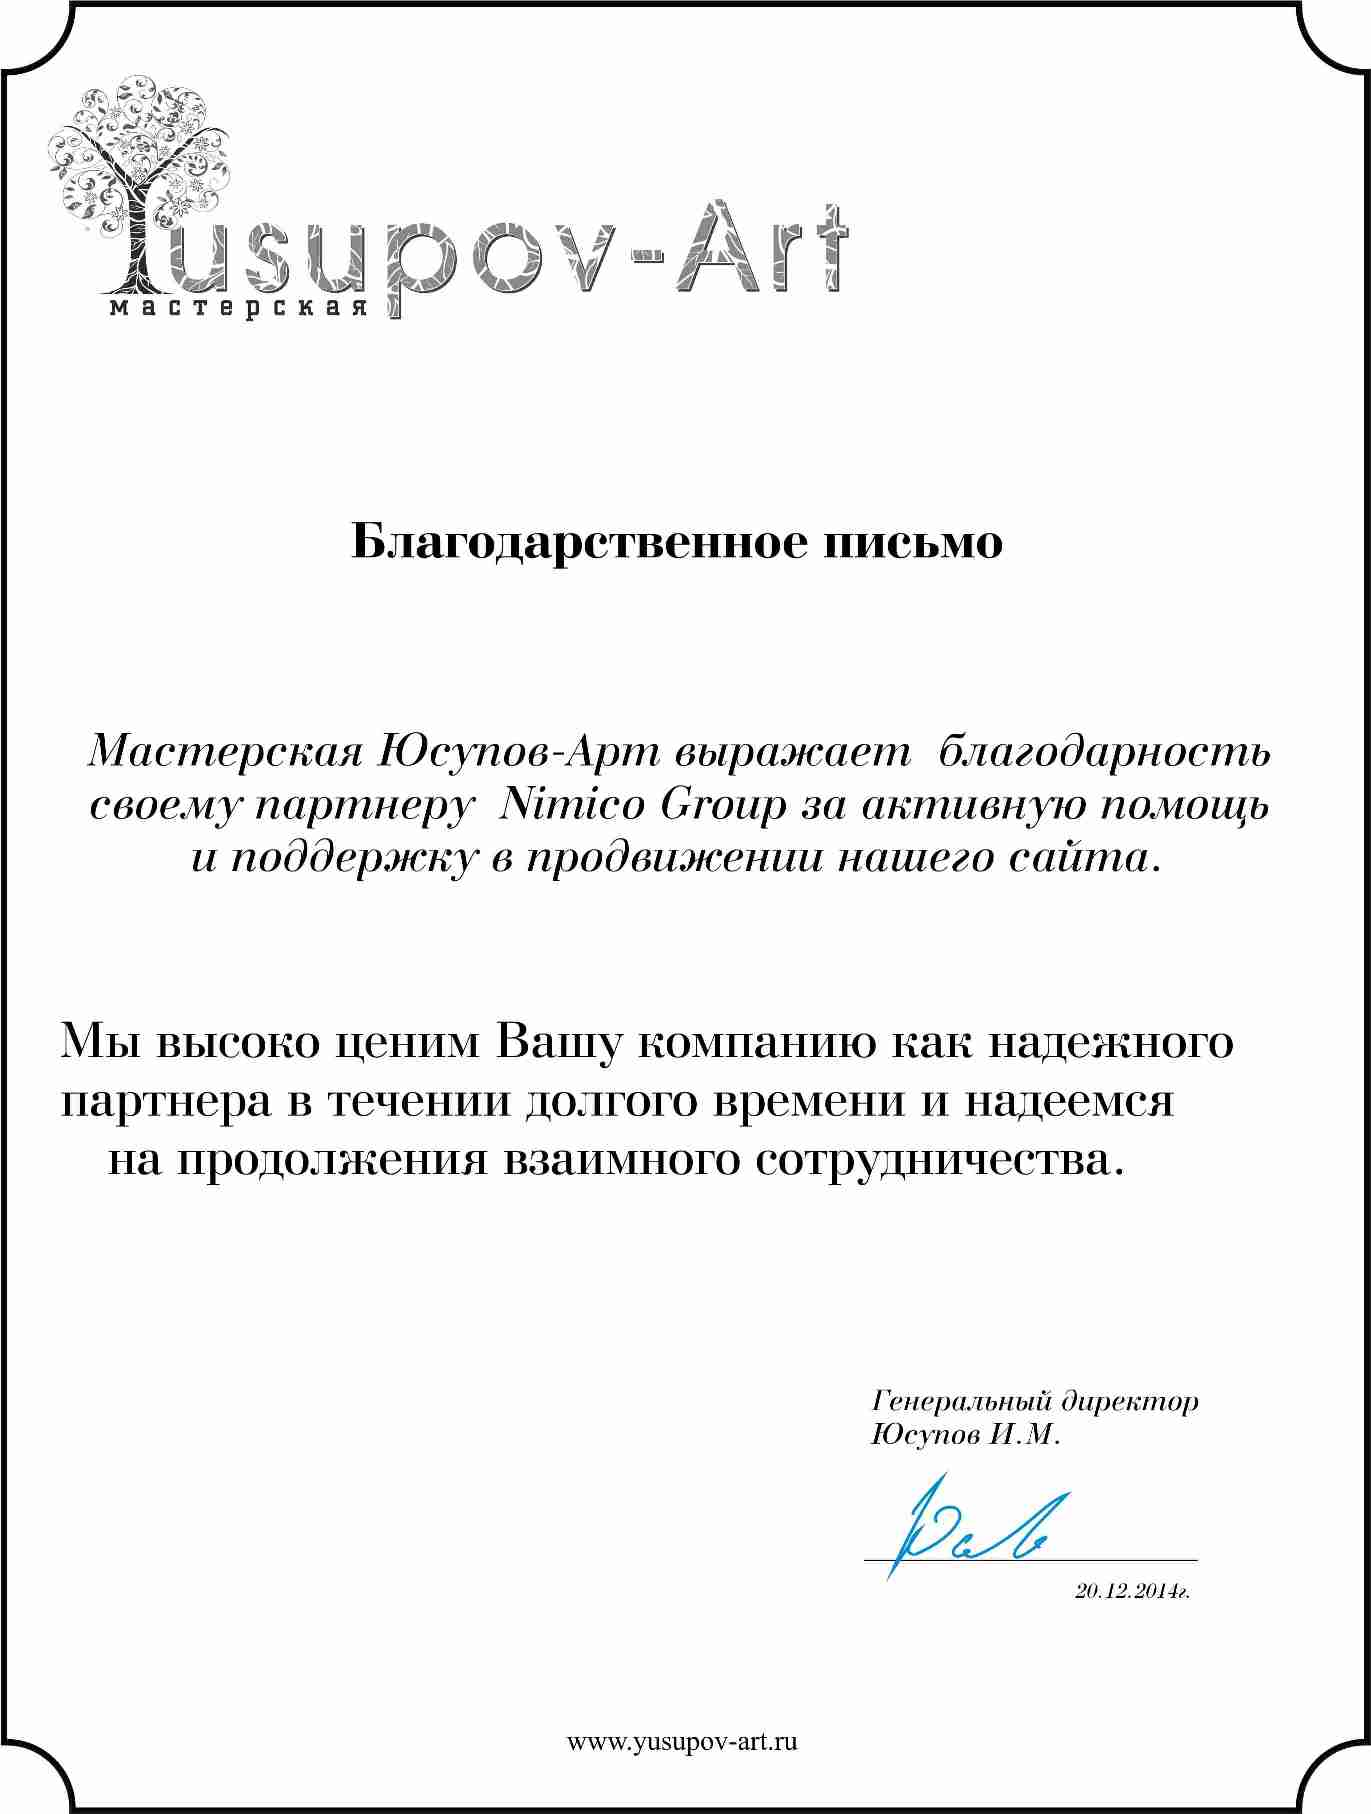 Граверная мастерская «Юсупов-Арт»/«Yusupov-Art.ru»